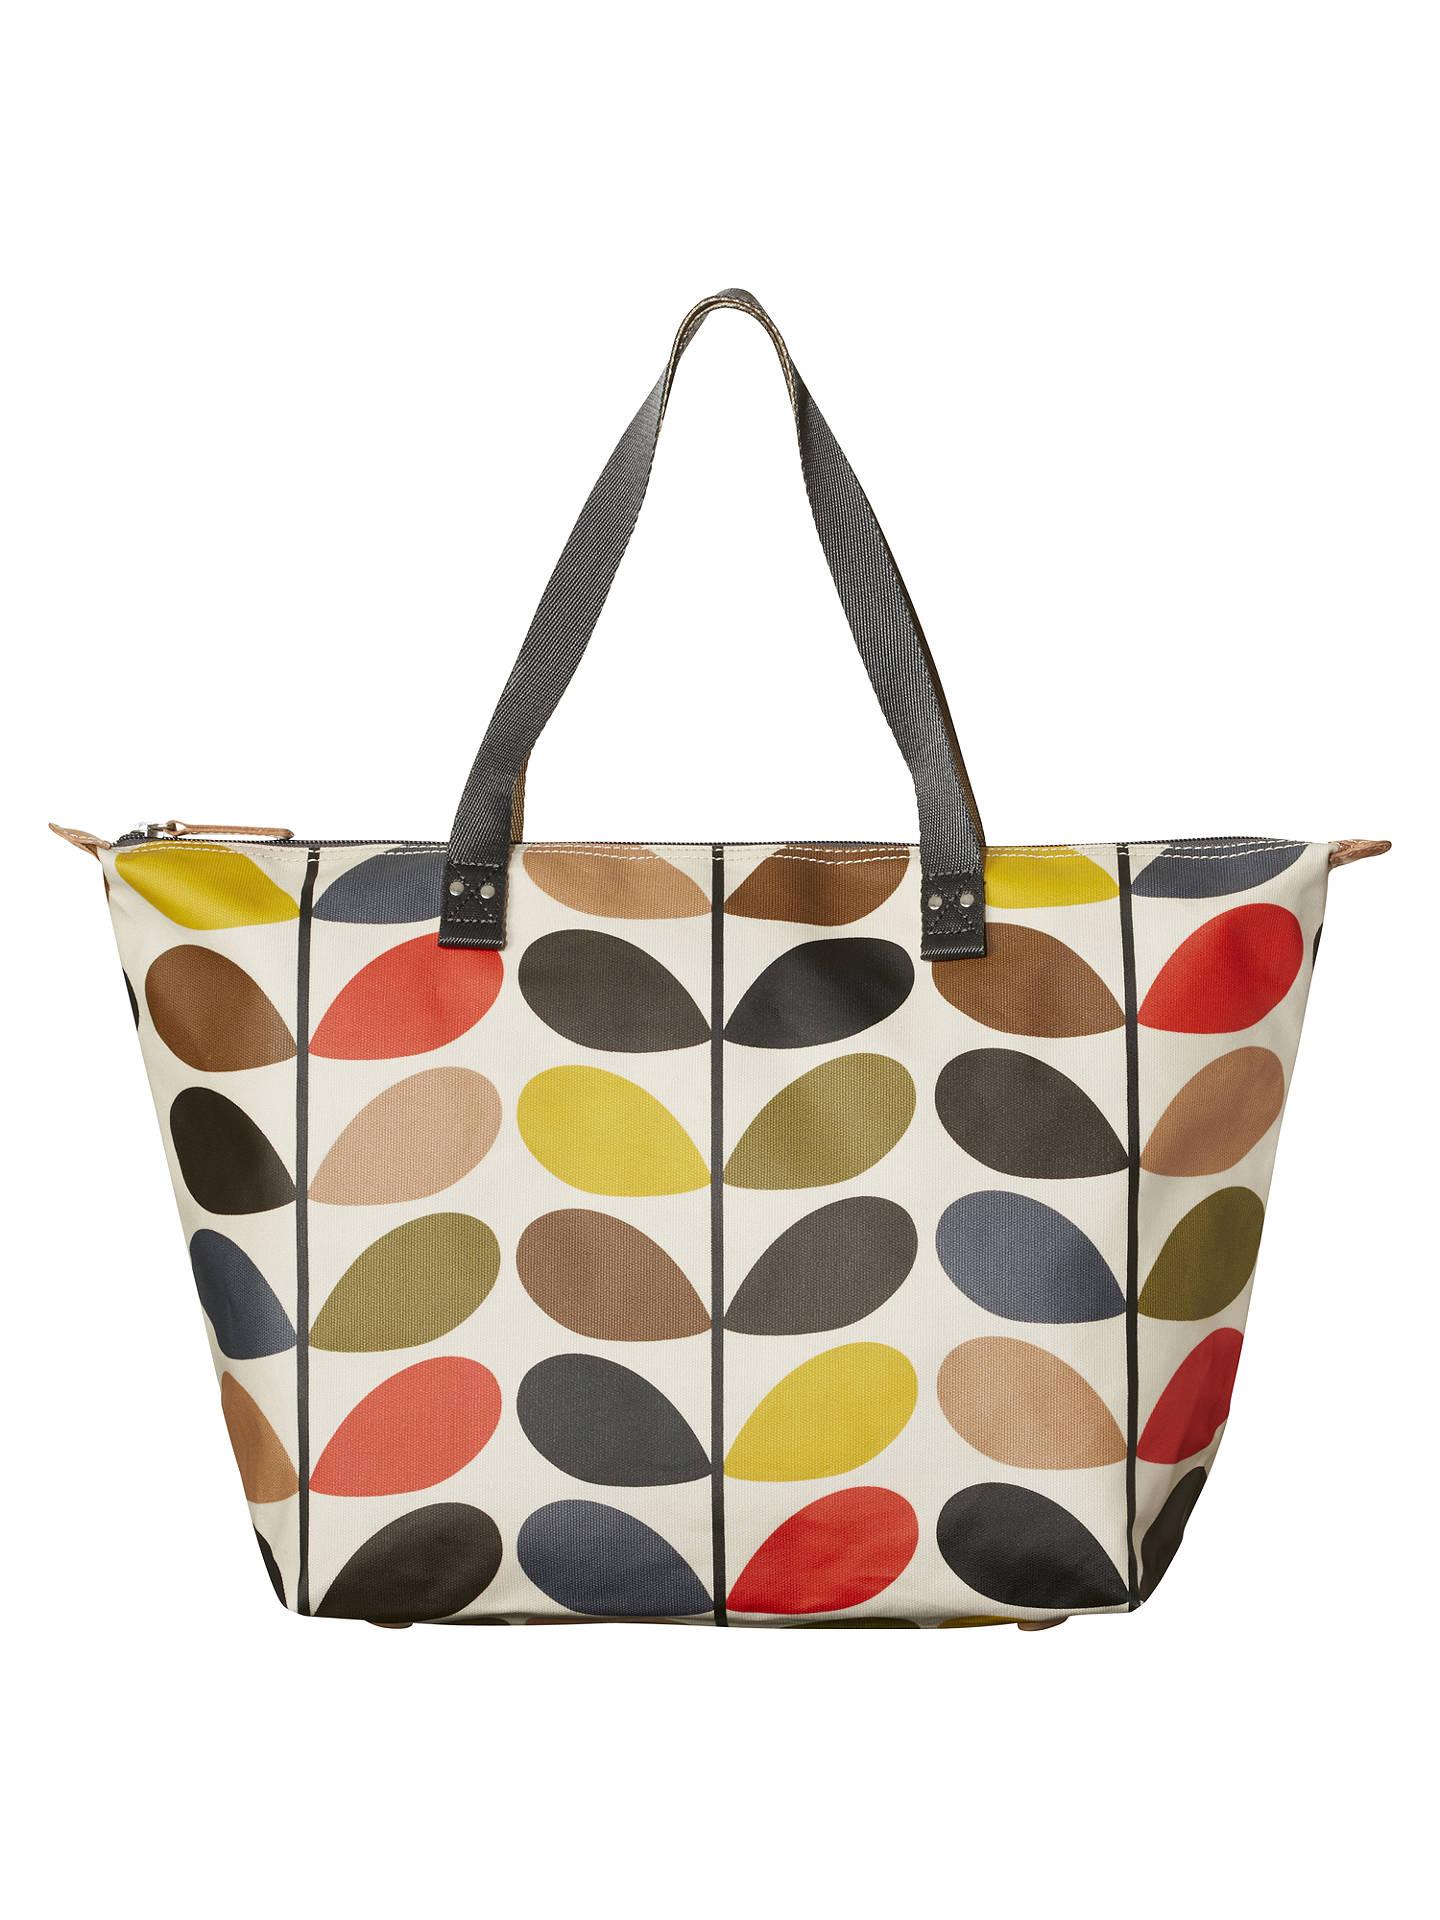 4bdbaa696 Buy Orla Kiely Classic Multi Stem Zip Shoulder Bag, Multi Online at  johnlewis.com ...